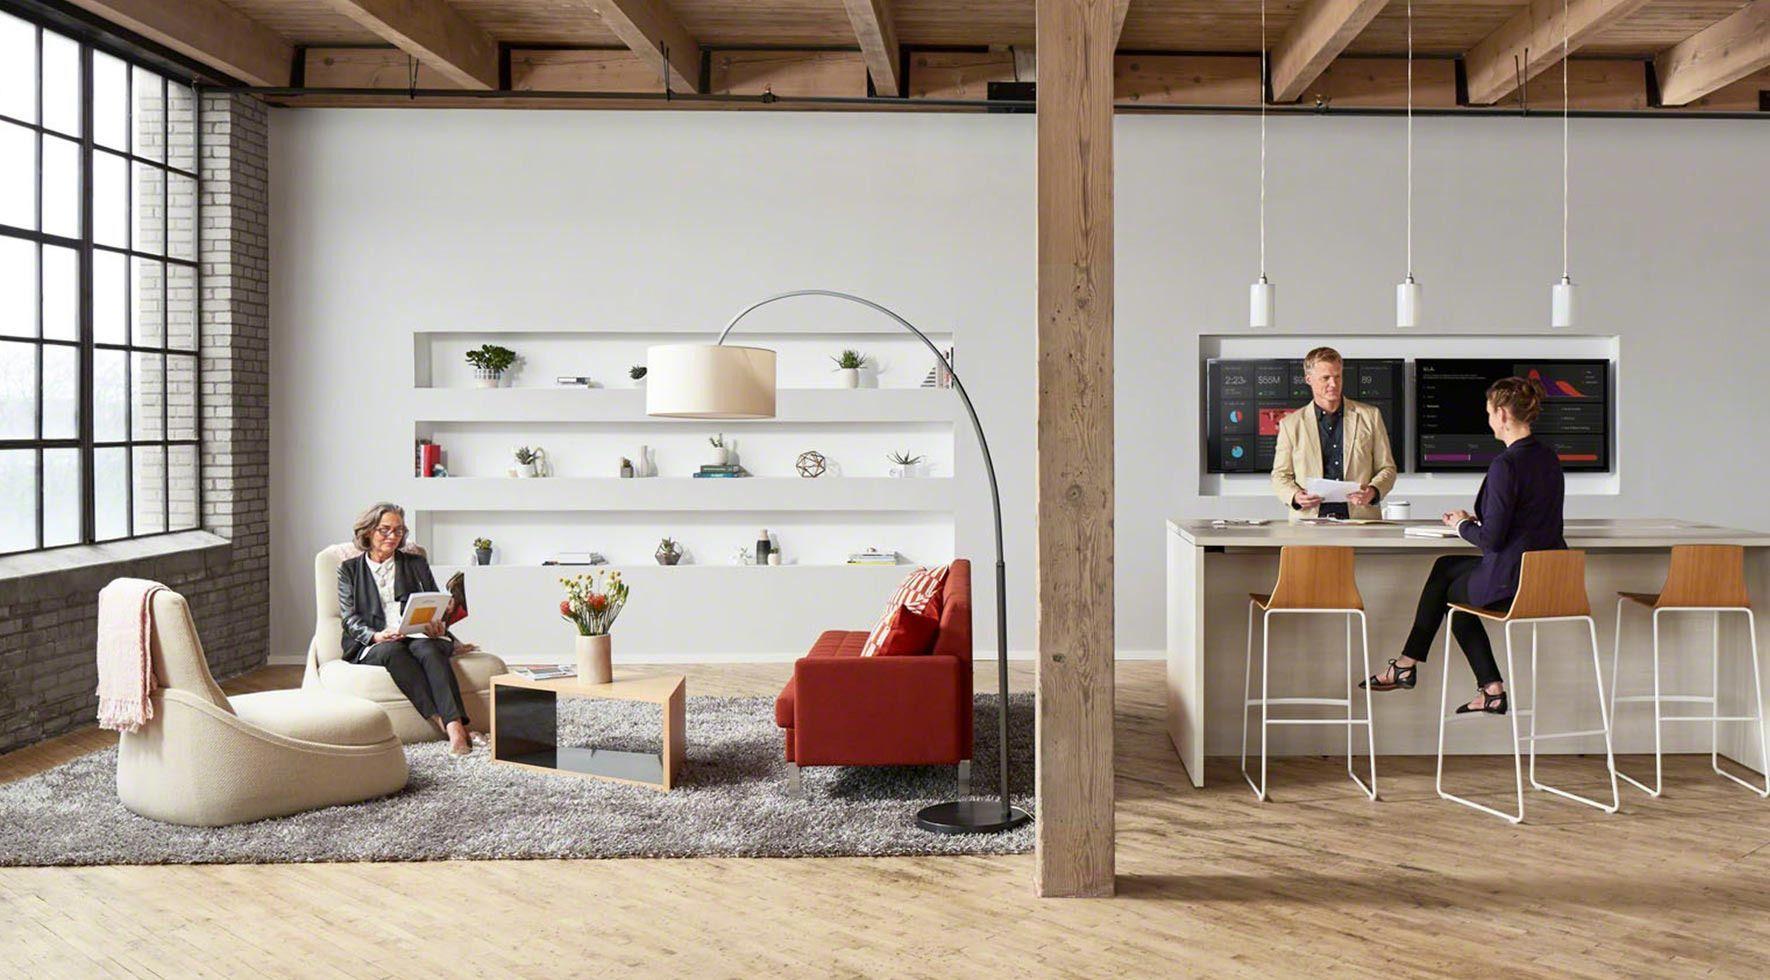 Coalesse Hosu Lounge Millbrae Contract And Sebastopol Tables Create A Space Adjacent To